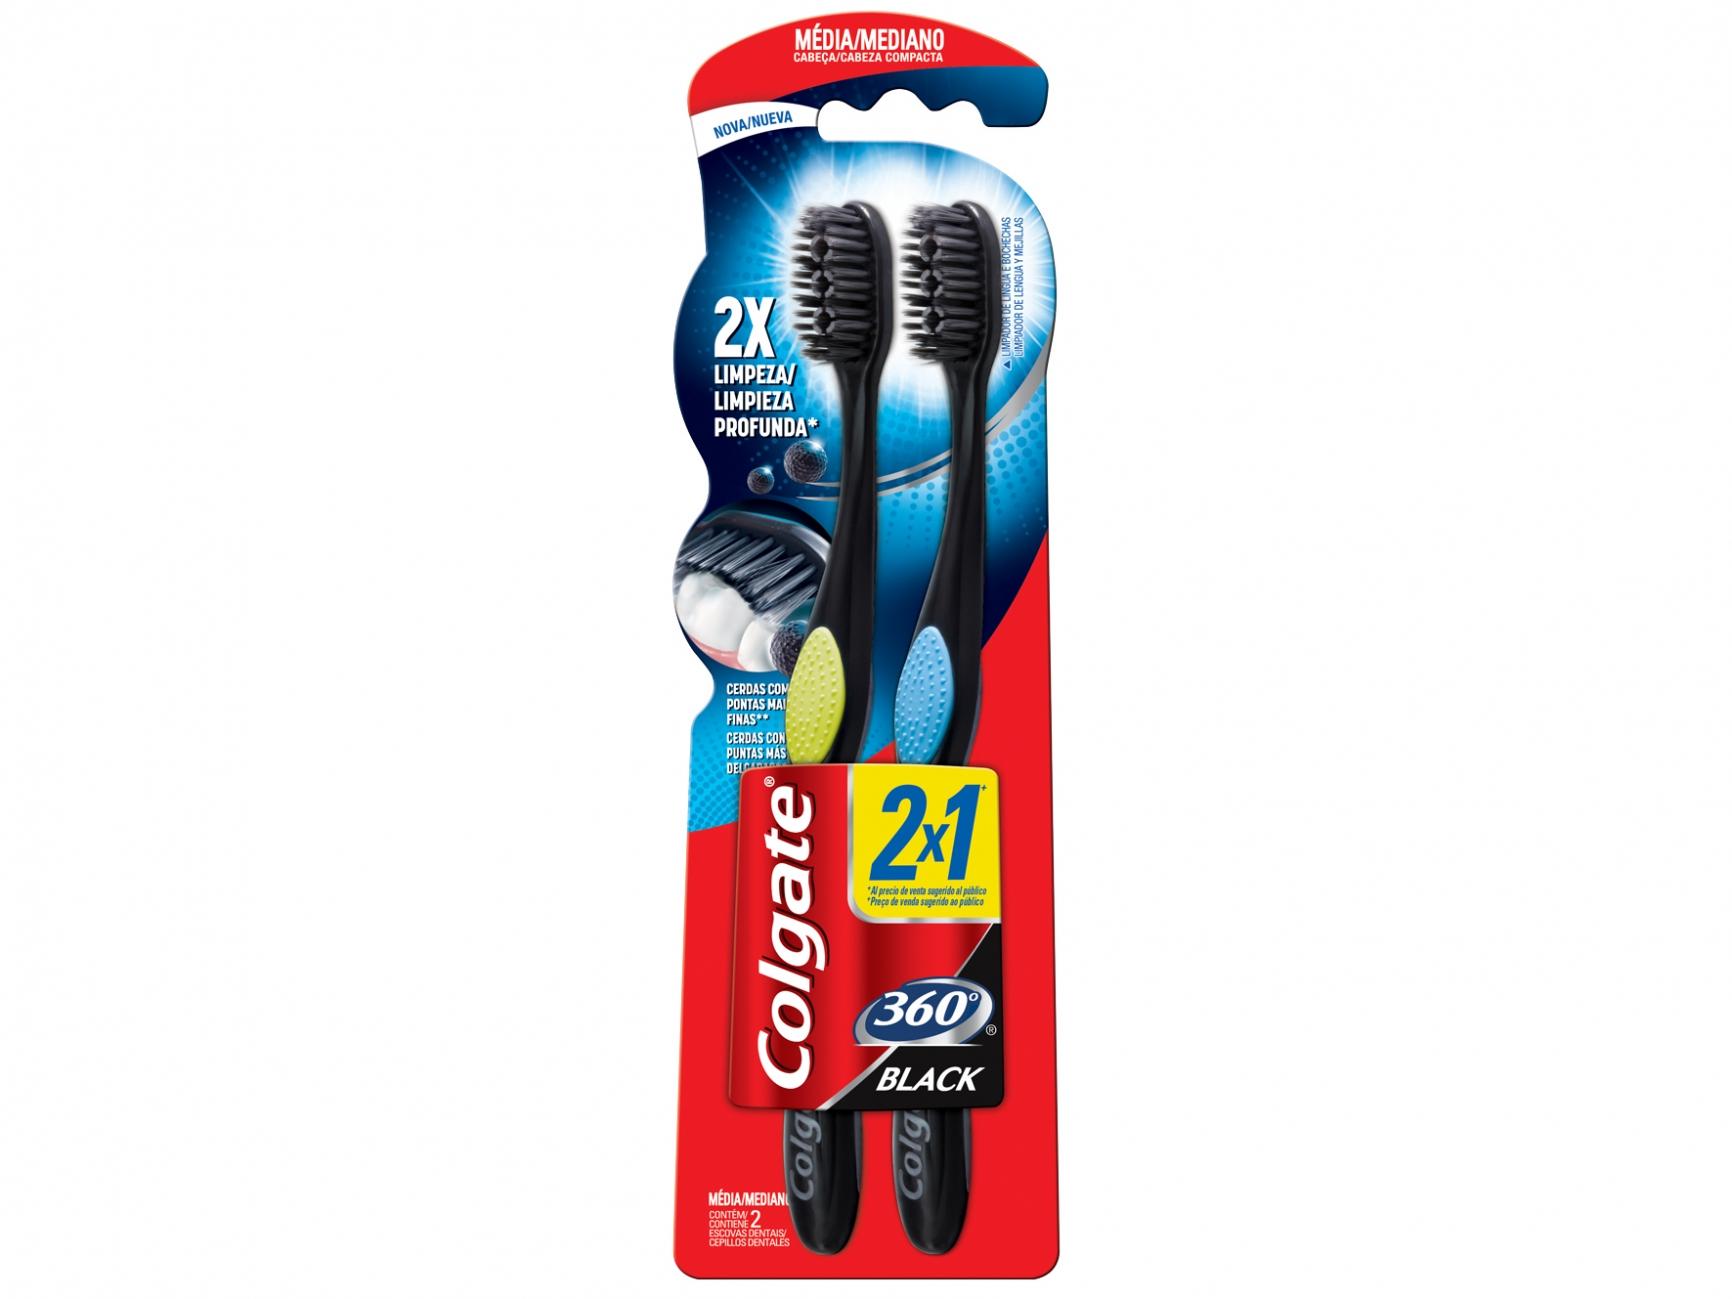 Escova Dental Colgate 360 Graus Black 2X1 Média